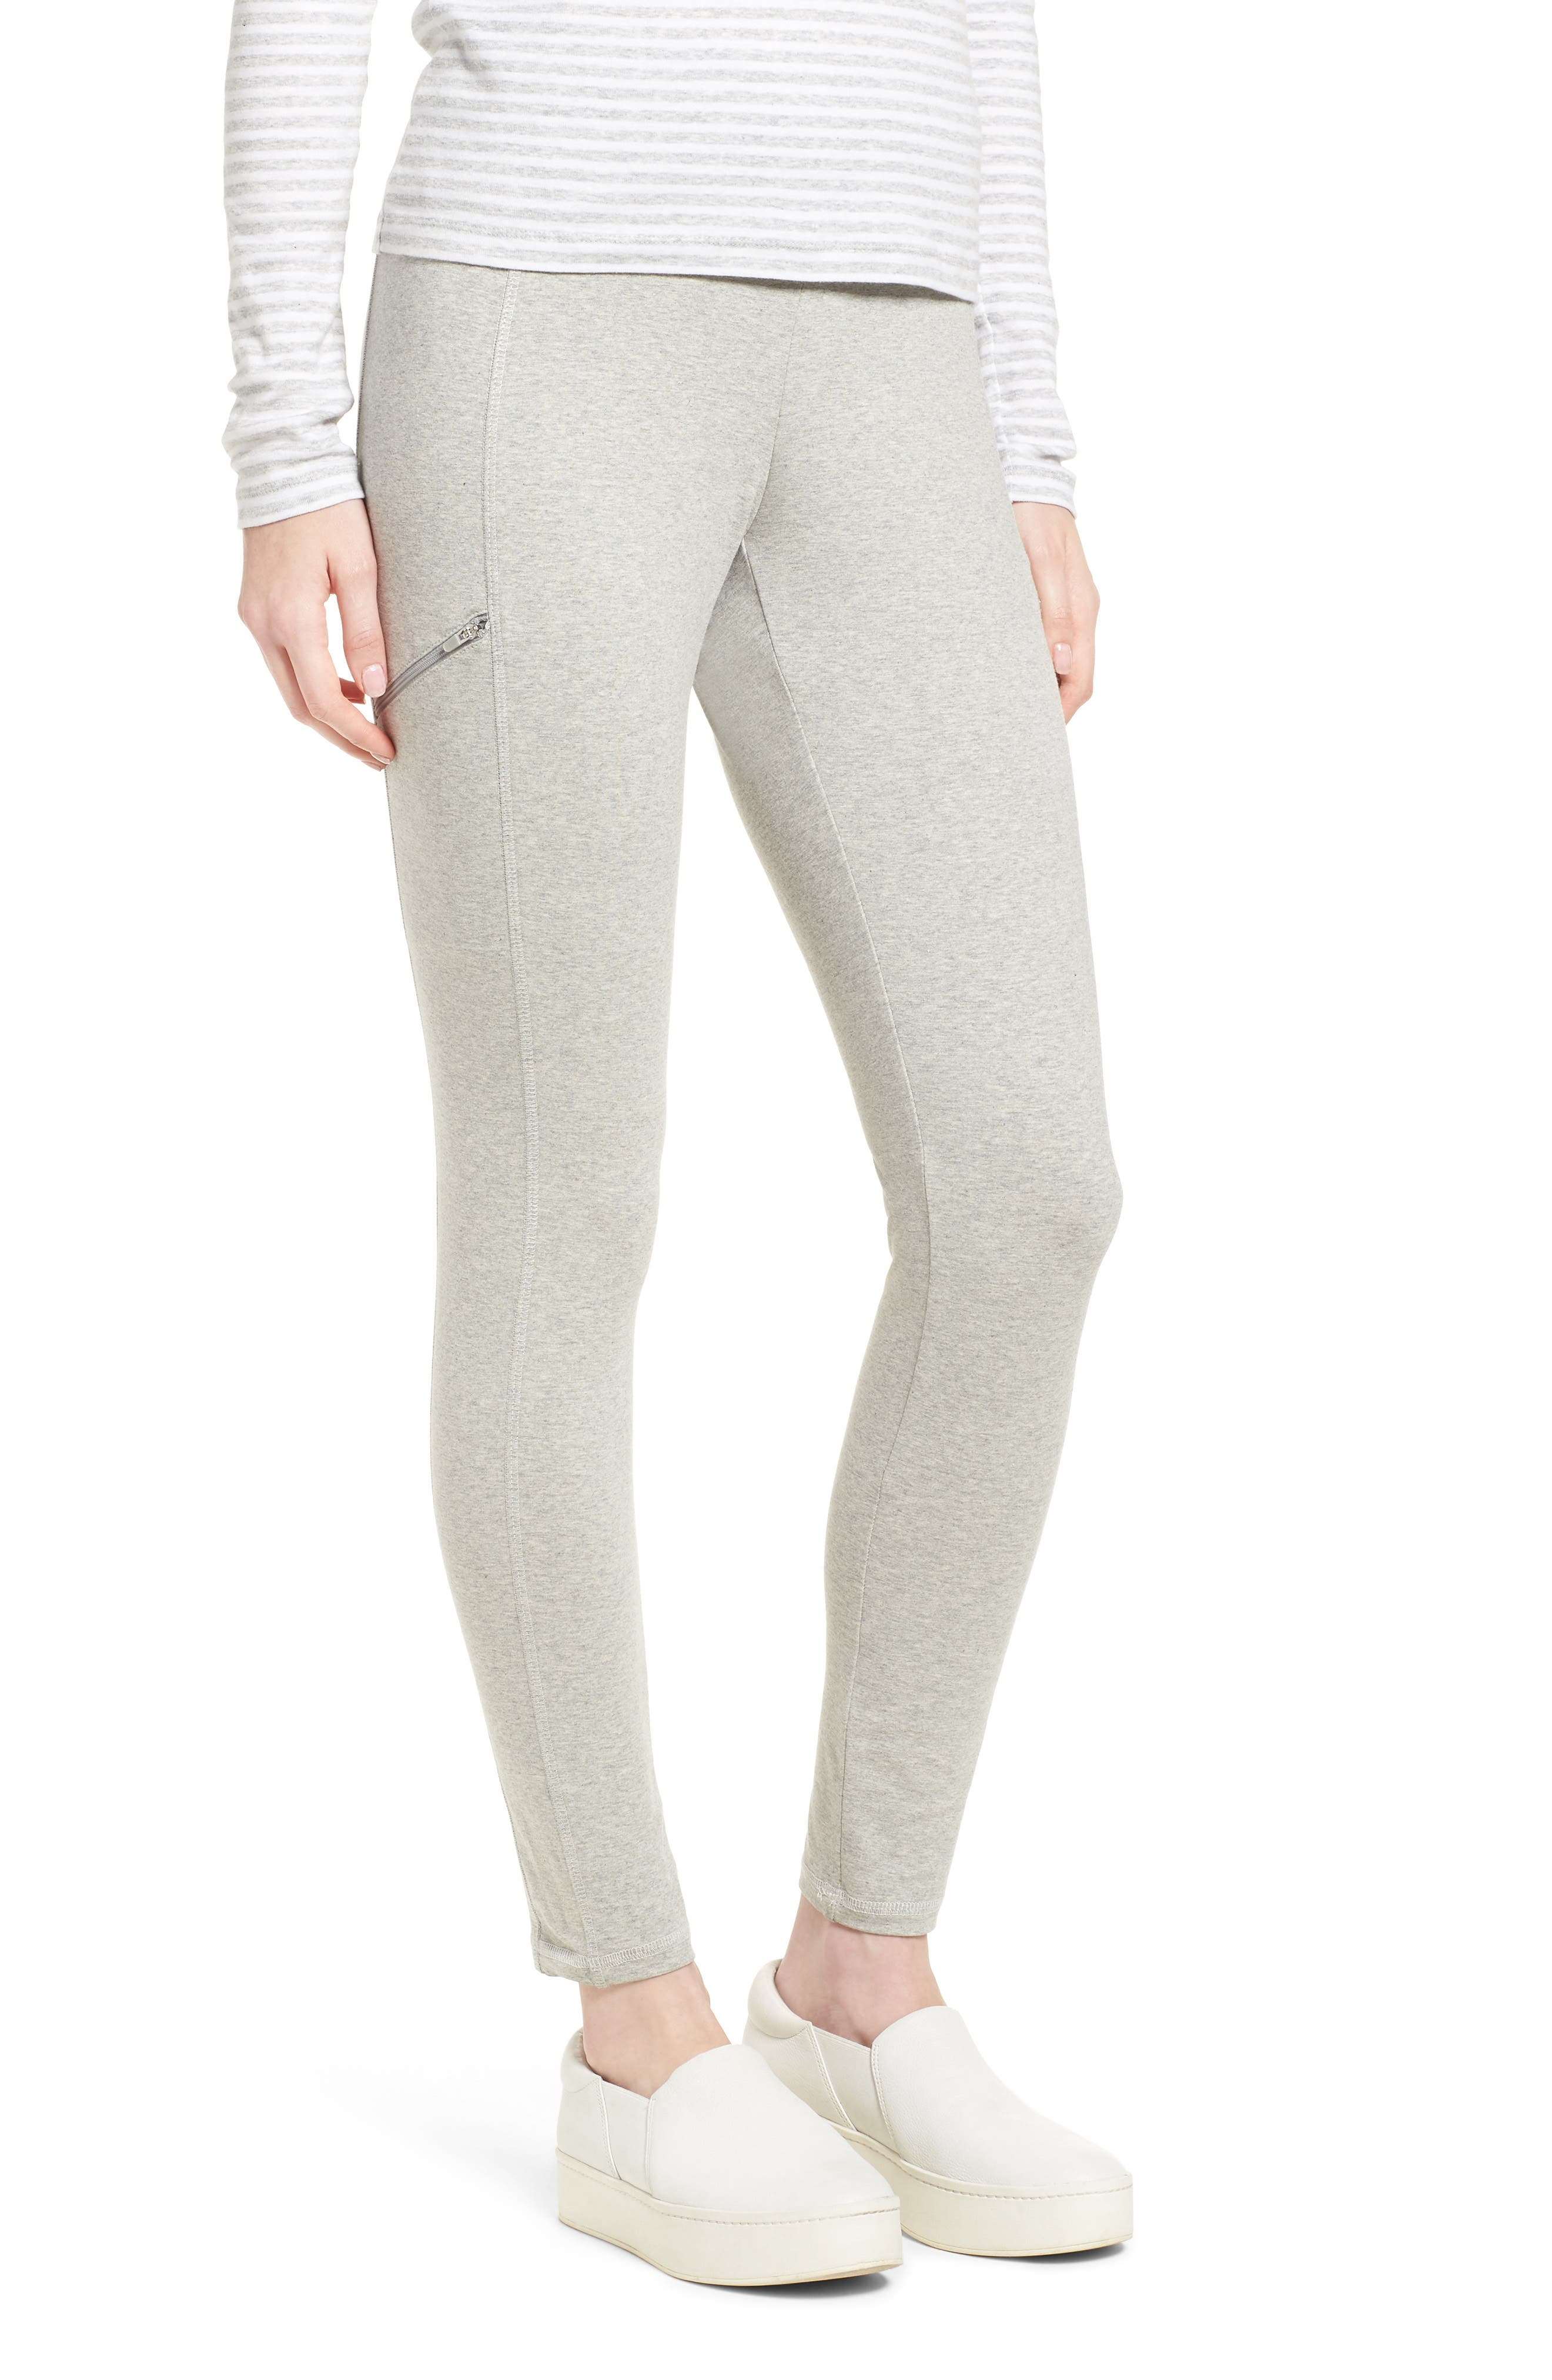 Eileen Fisher Stretch Organic Cotton Skinny Pants